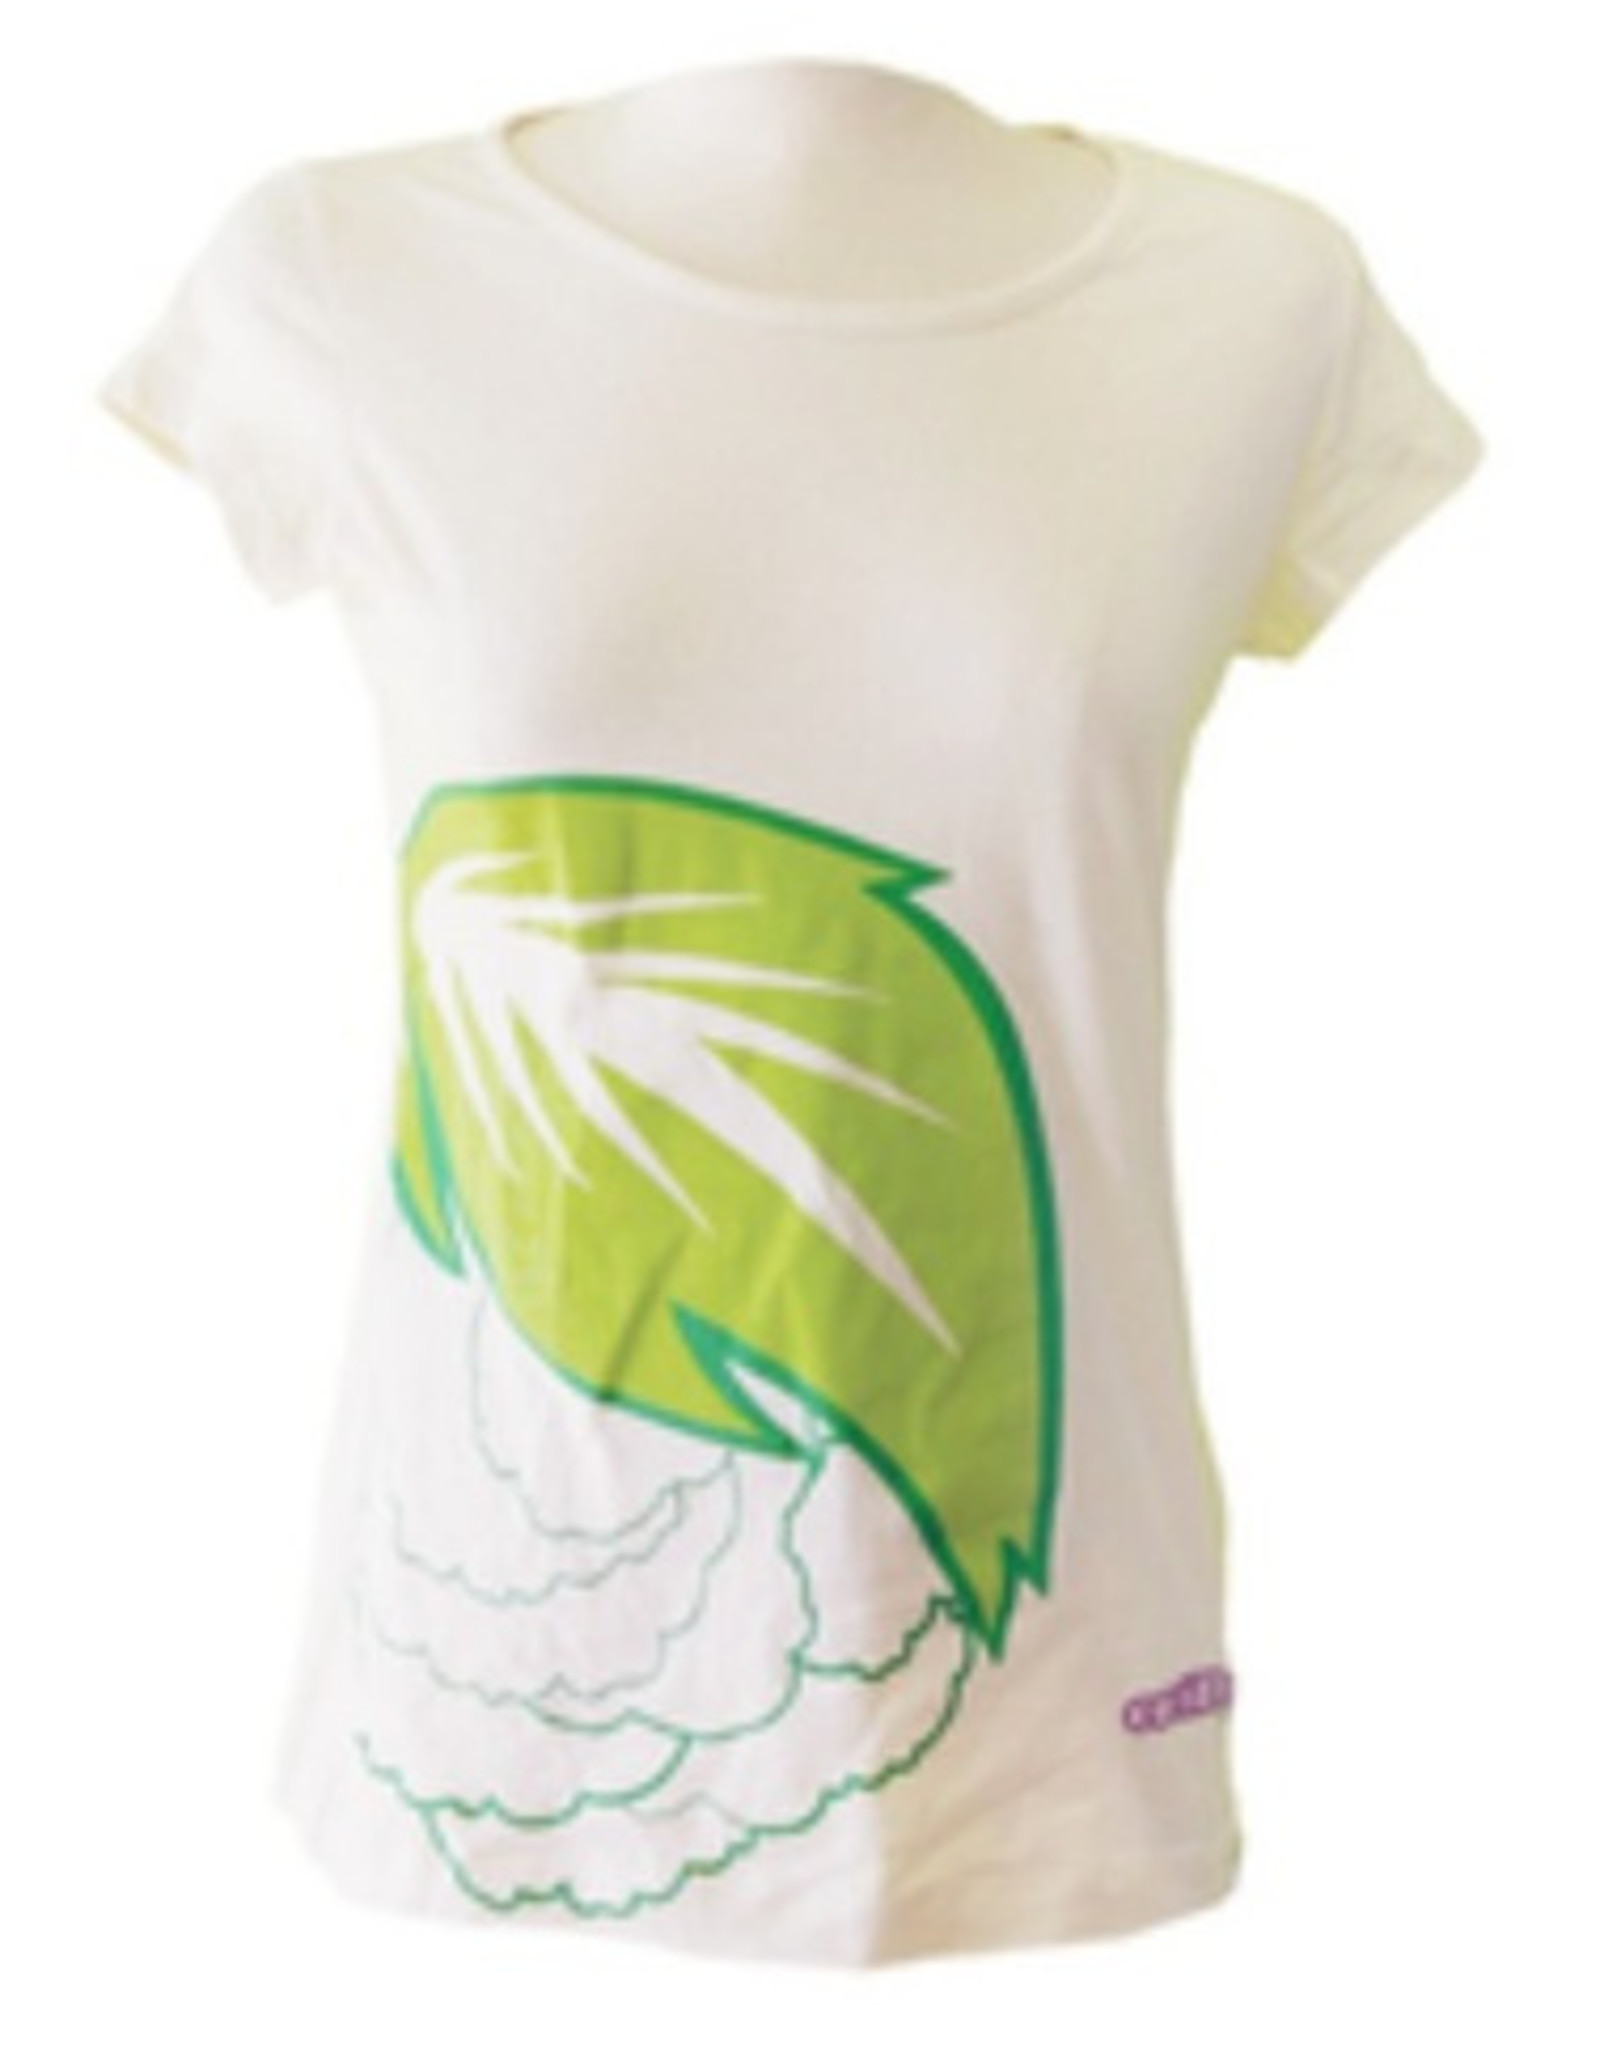 Camiseta mujer estampada Cooliflower.